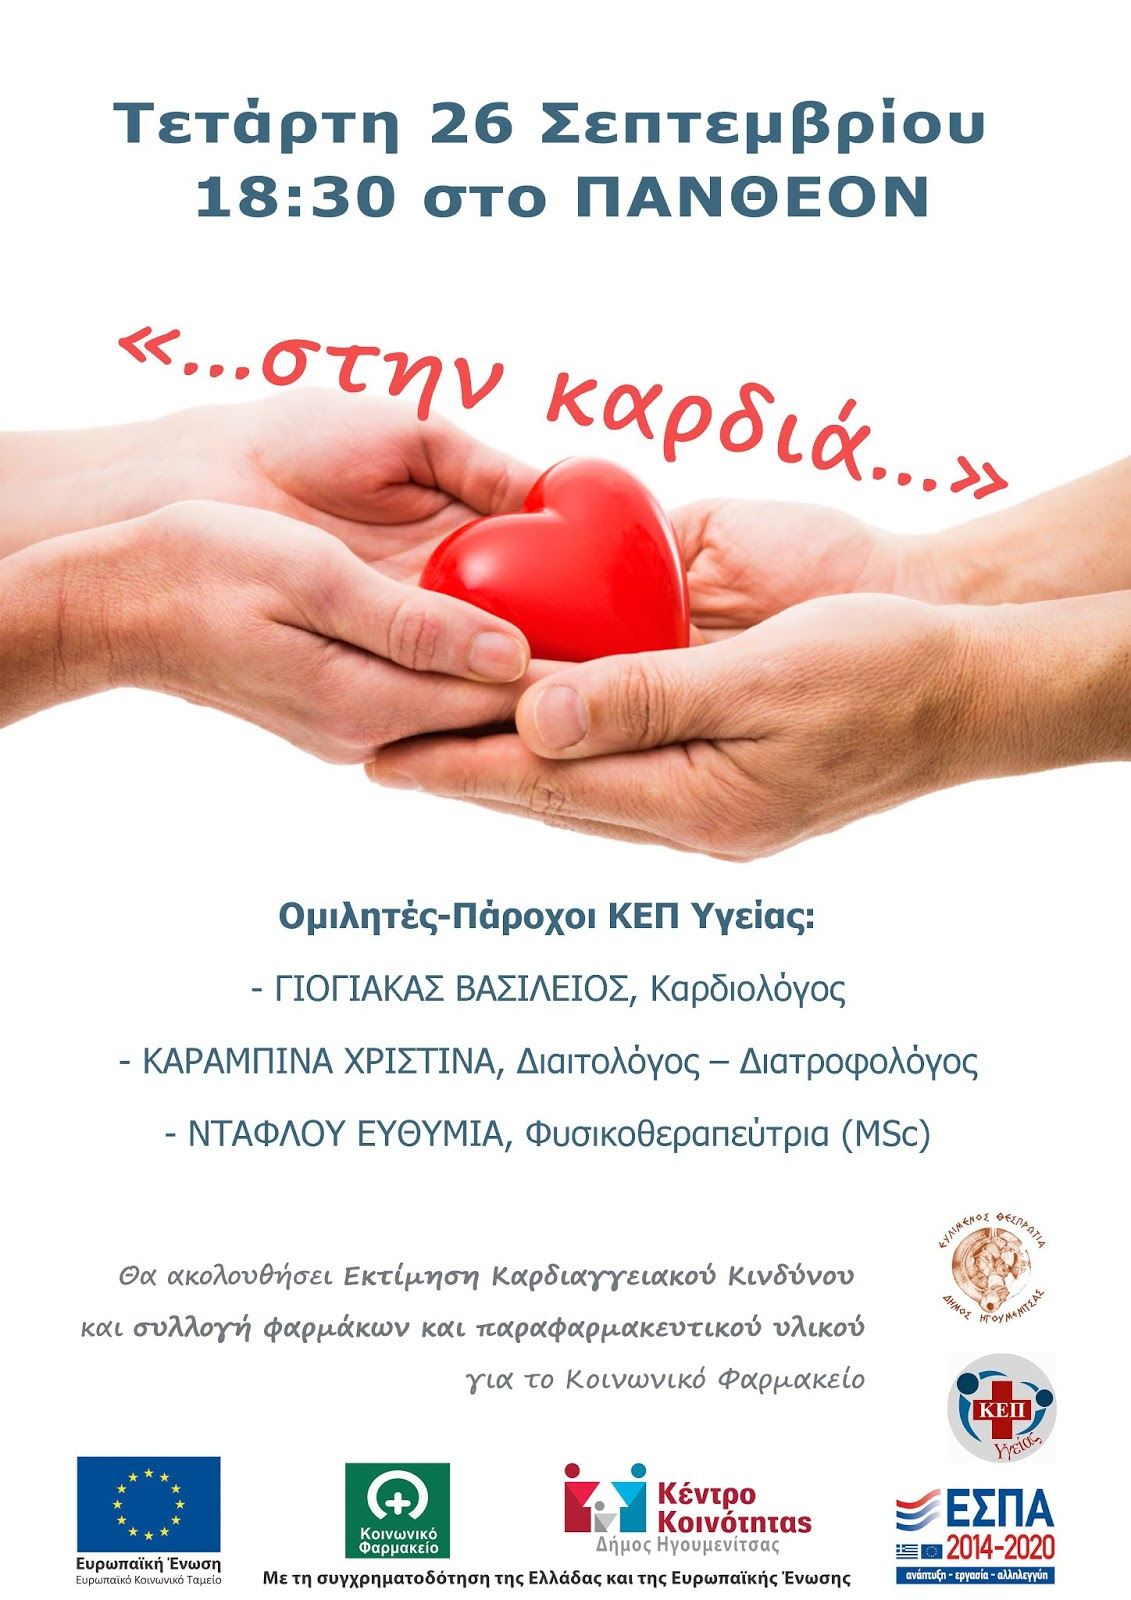 Hγουμενίτσα: Eκδήλωση αφιερωμένη στην Παγκόσμια Ημέρα Καρδιάς